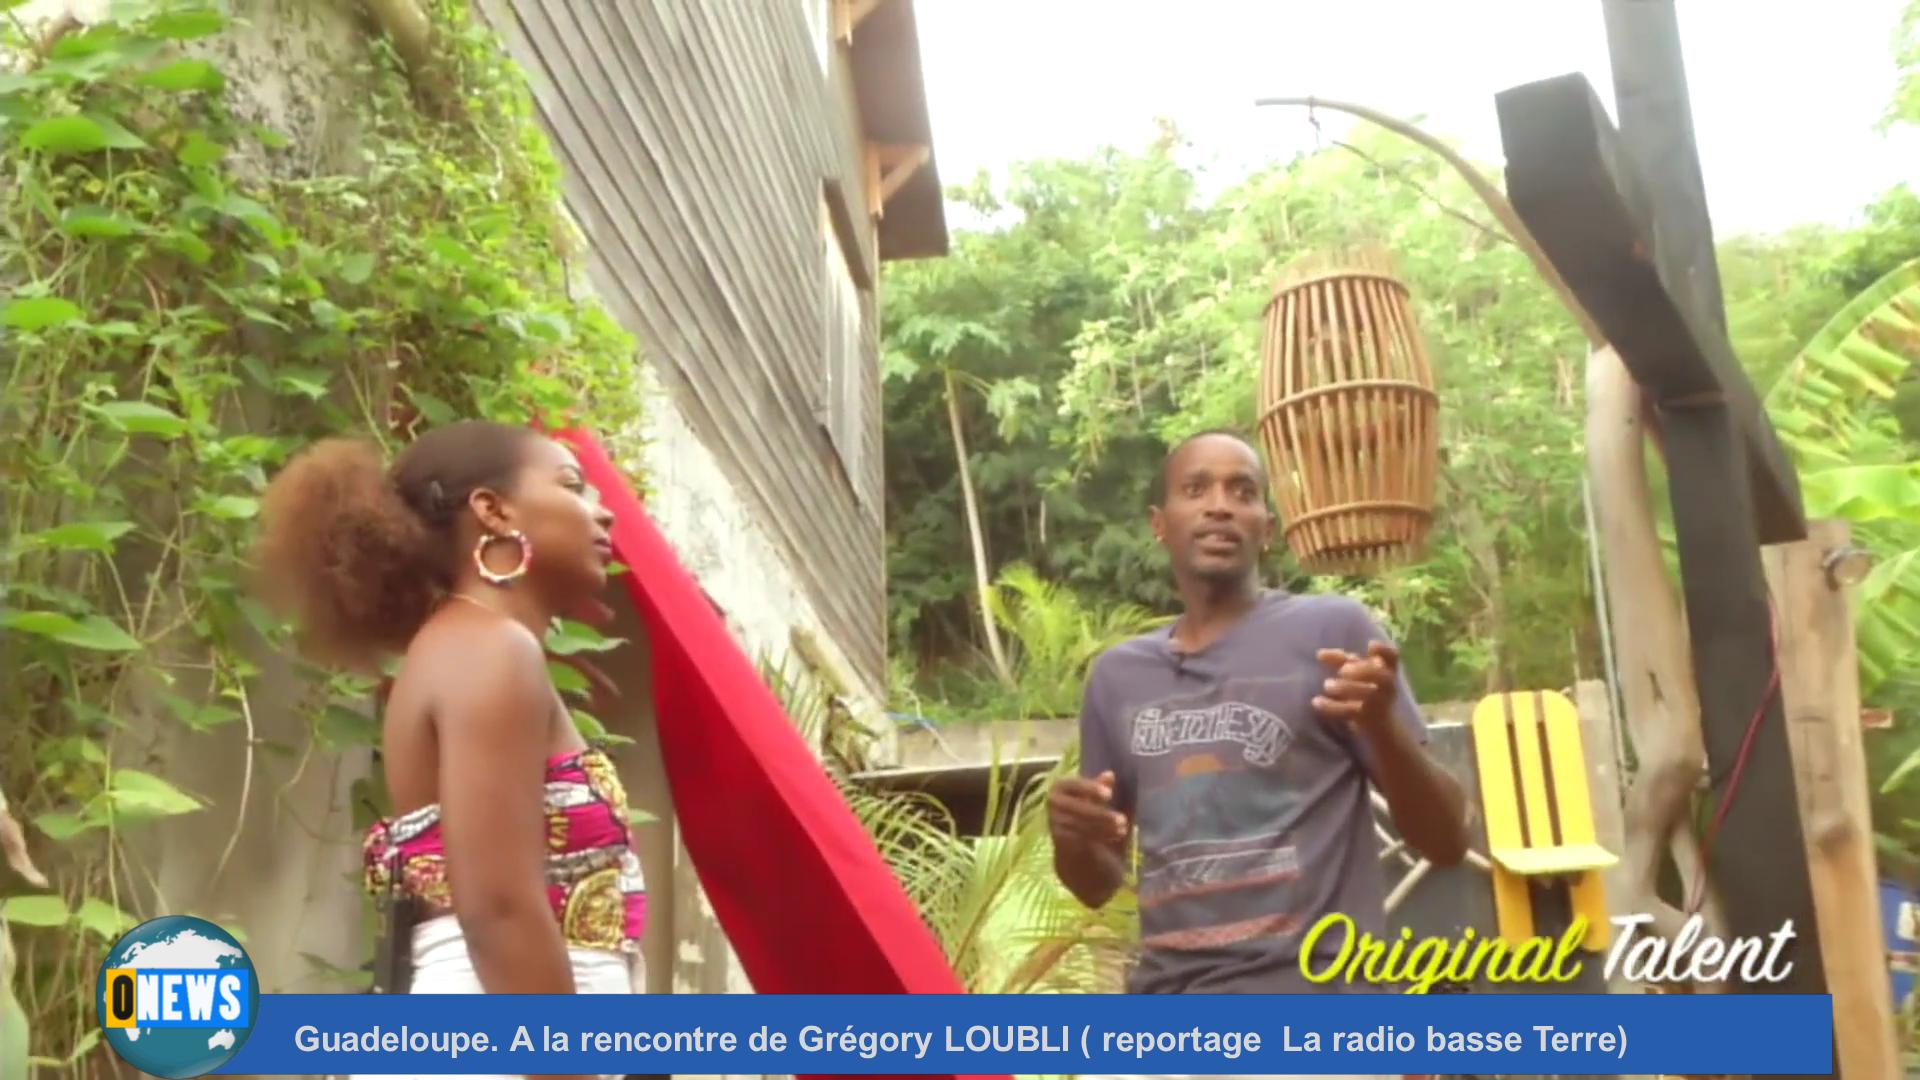 [Vidéo] Onews Guadeloupe. A la rencontre de Grégory LOUBLI ( Reportage La radio basse Terre)